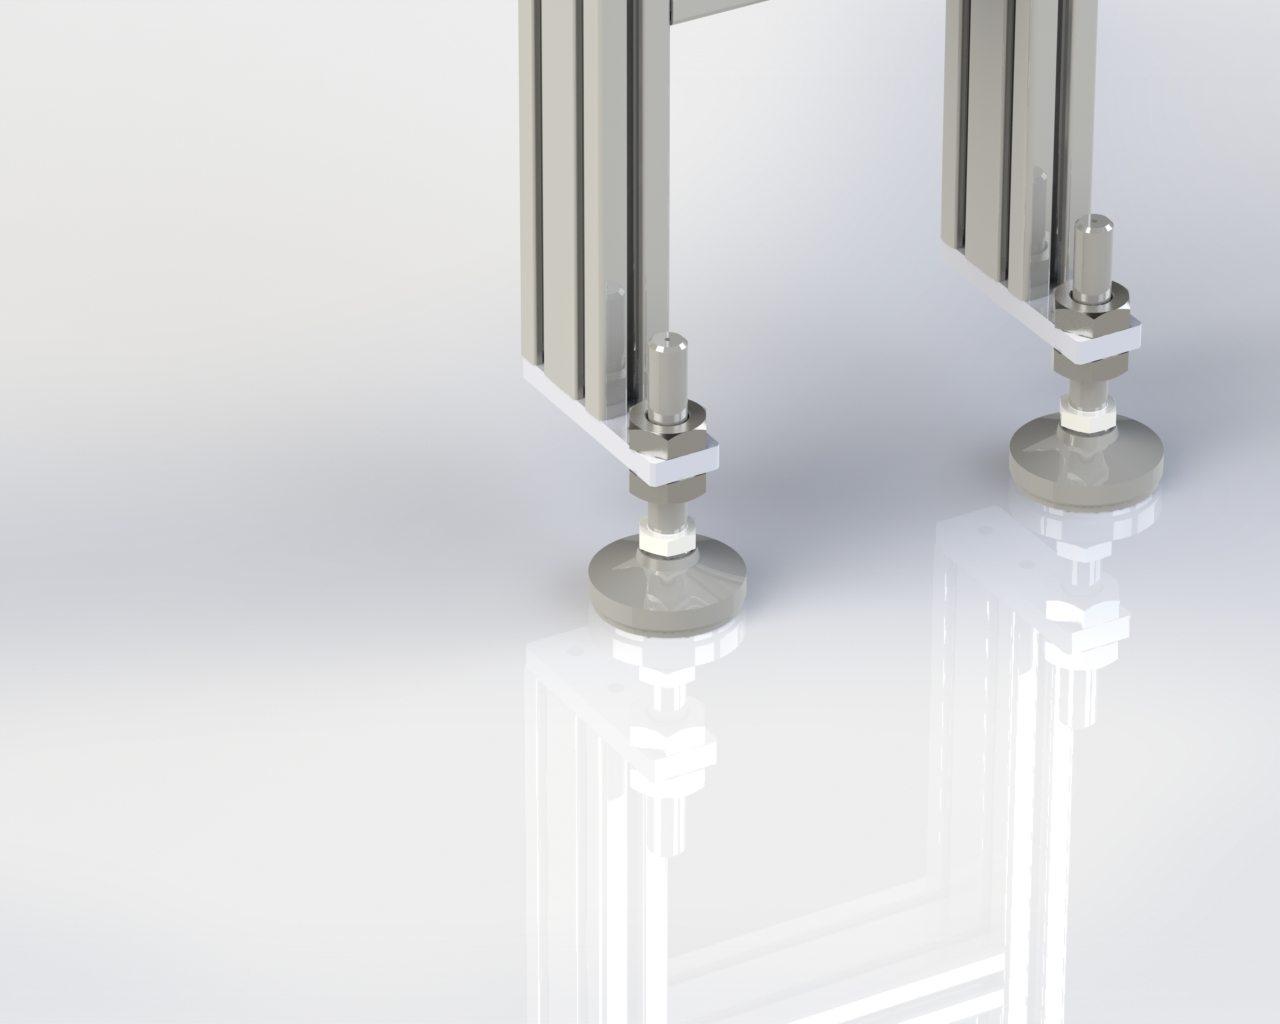 Model 55 Floor Stand Leveling Foot